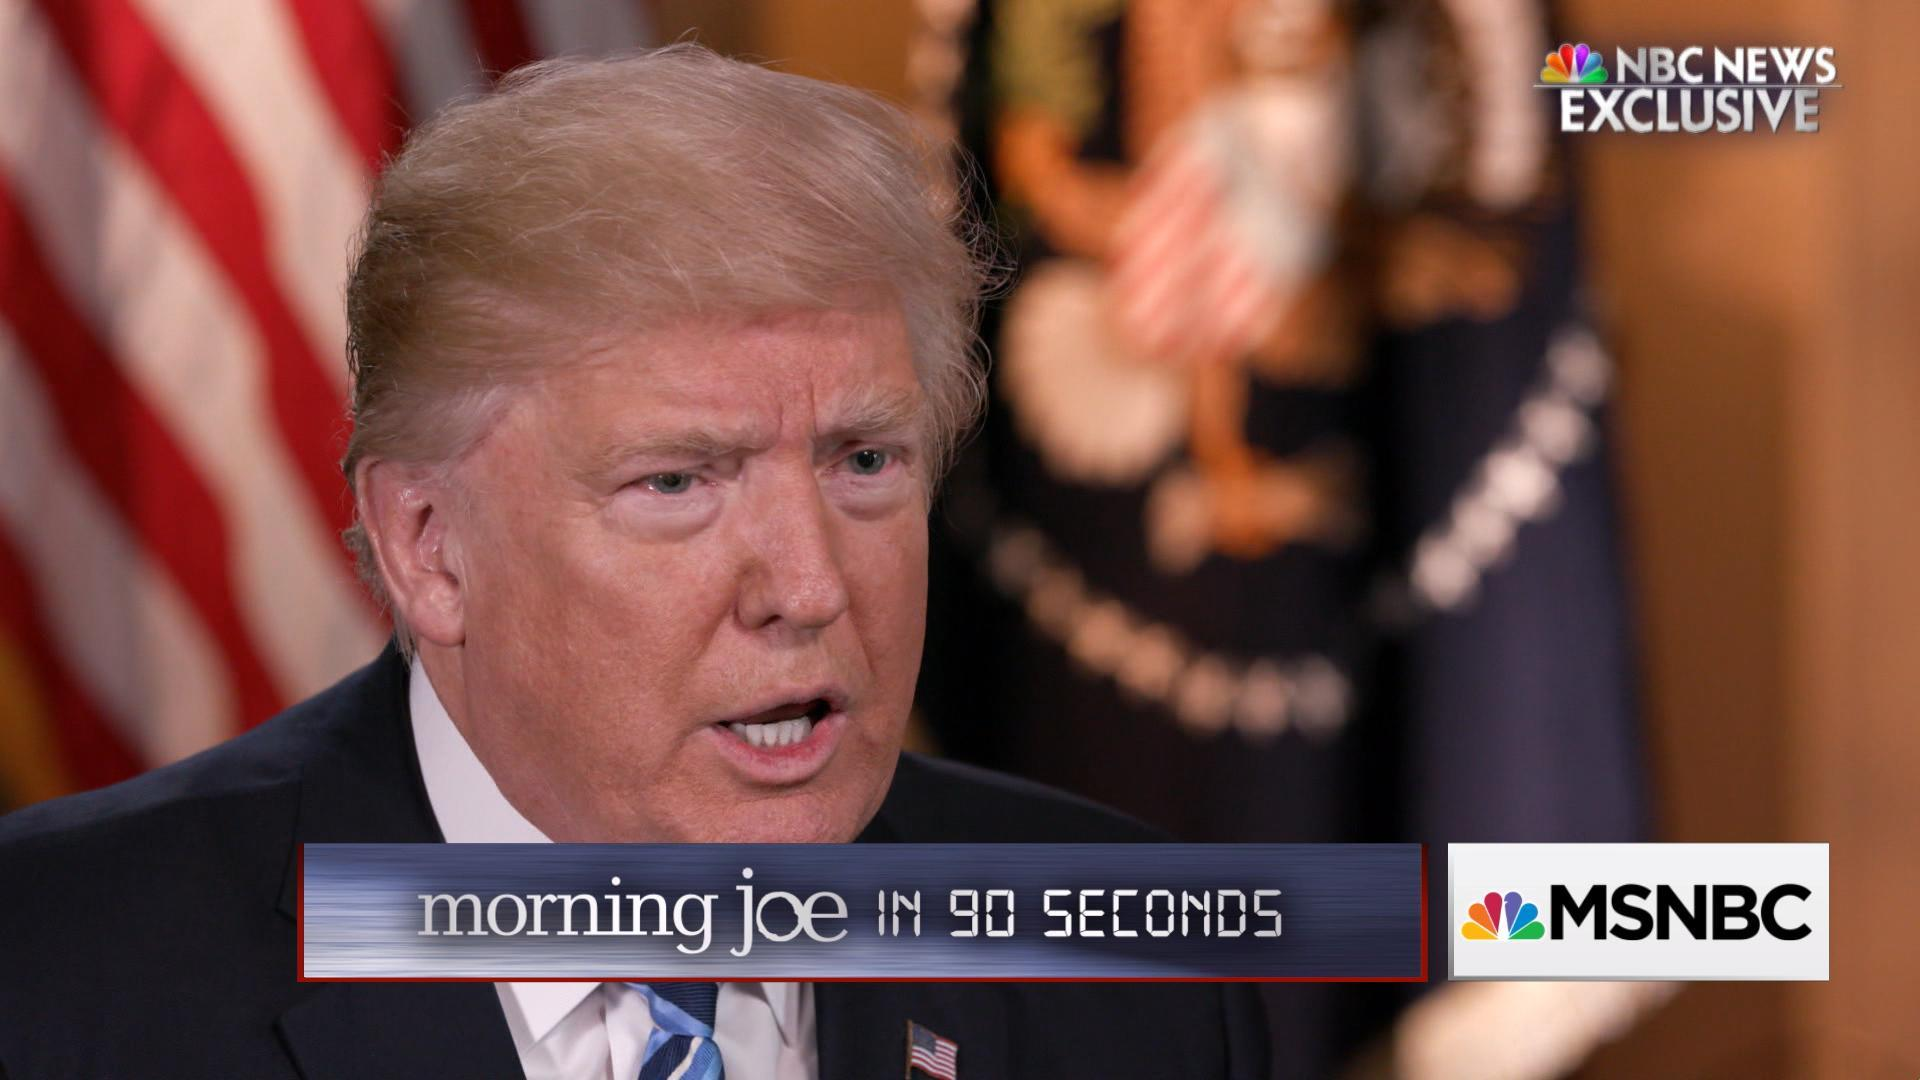 Morning Joe in 90 seconds